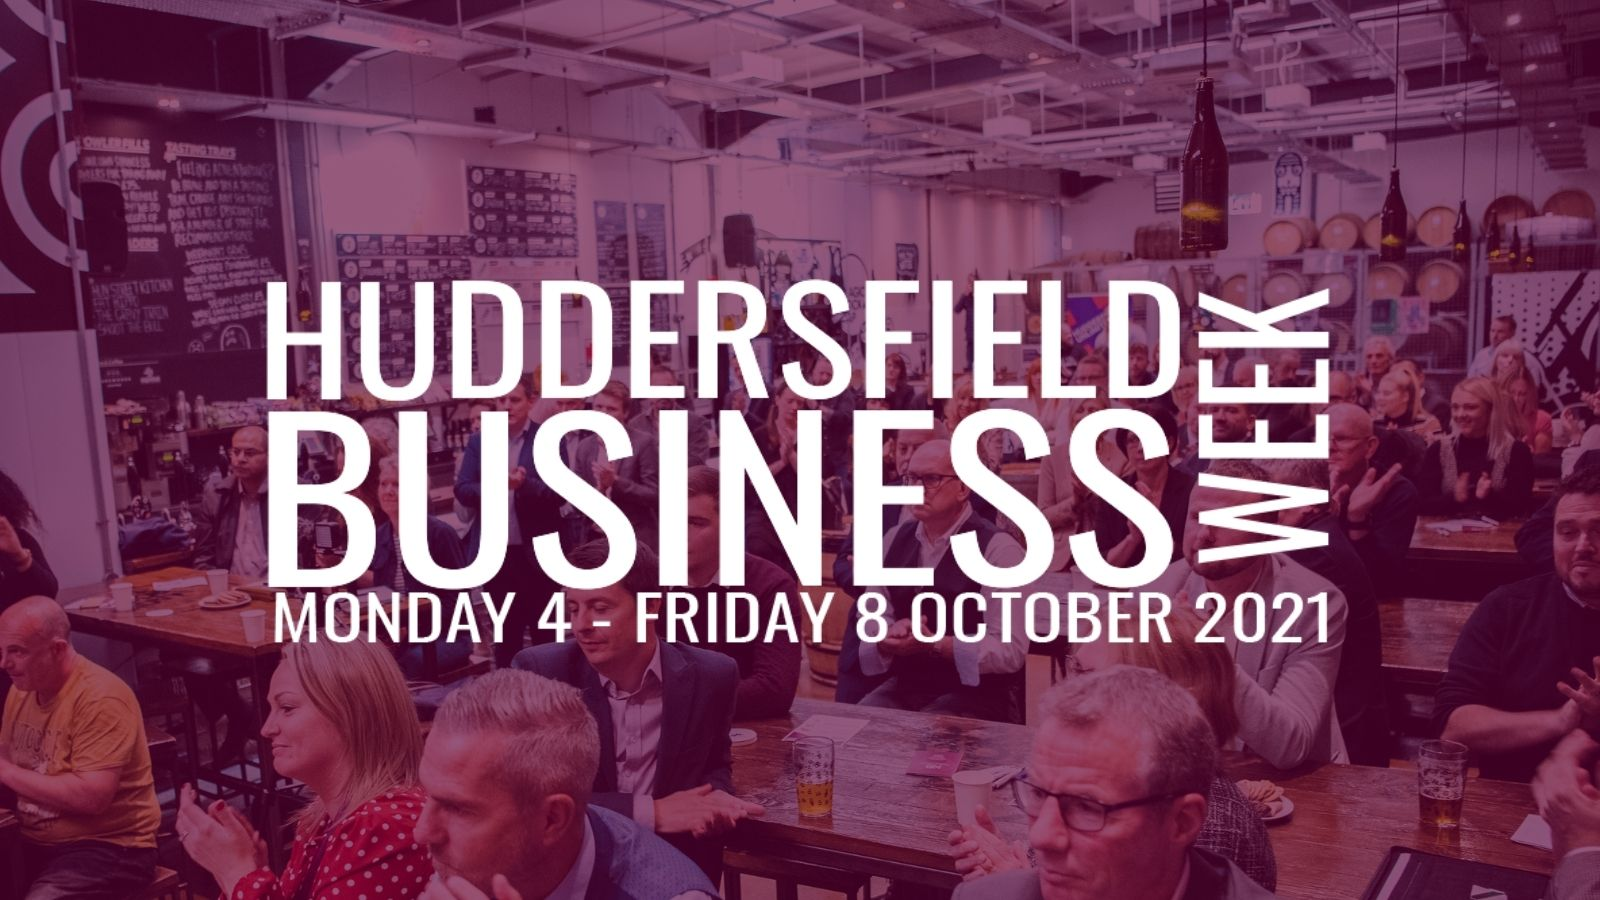 Huddersfield Business Week to return this Autumn!